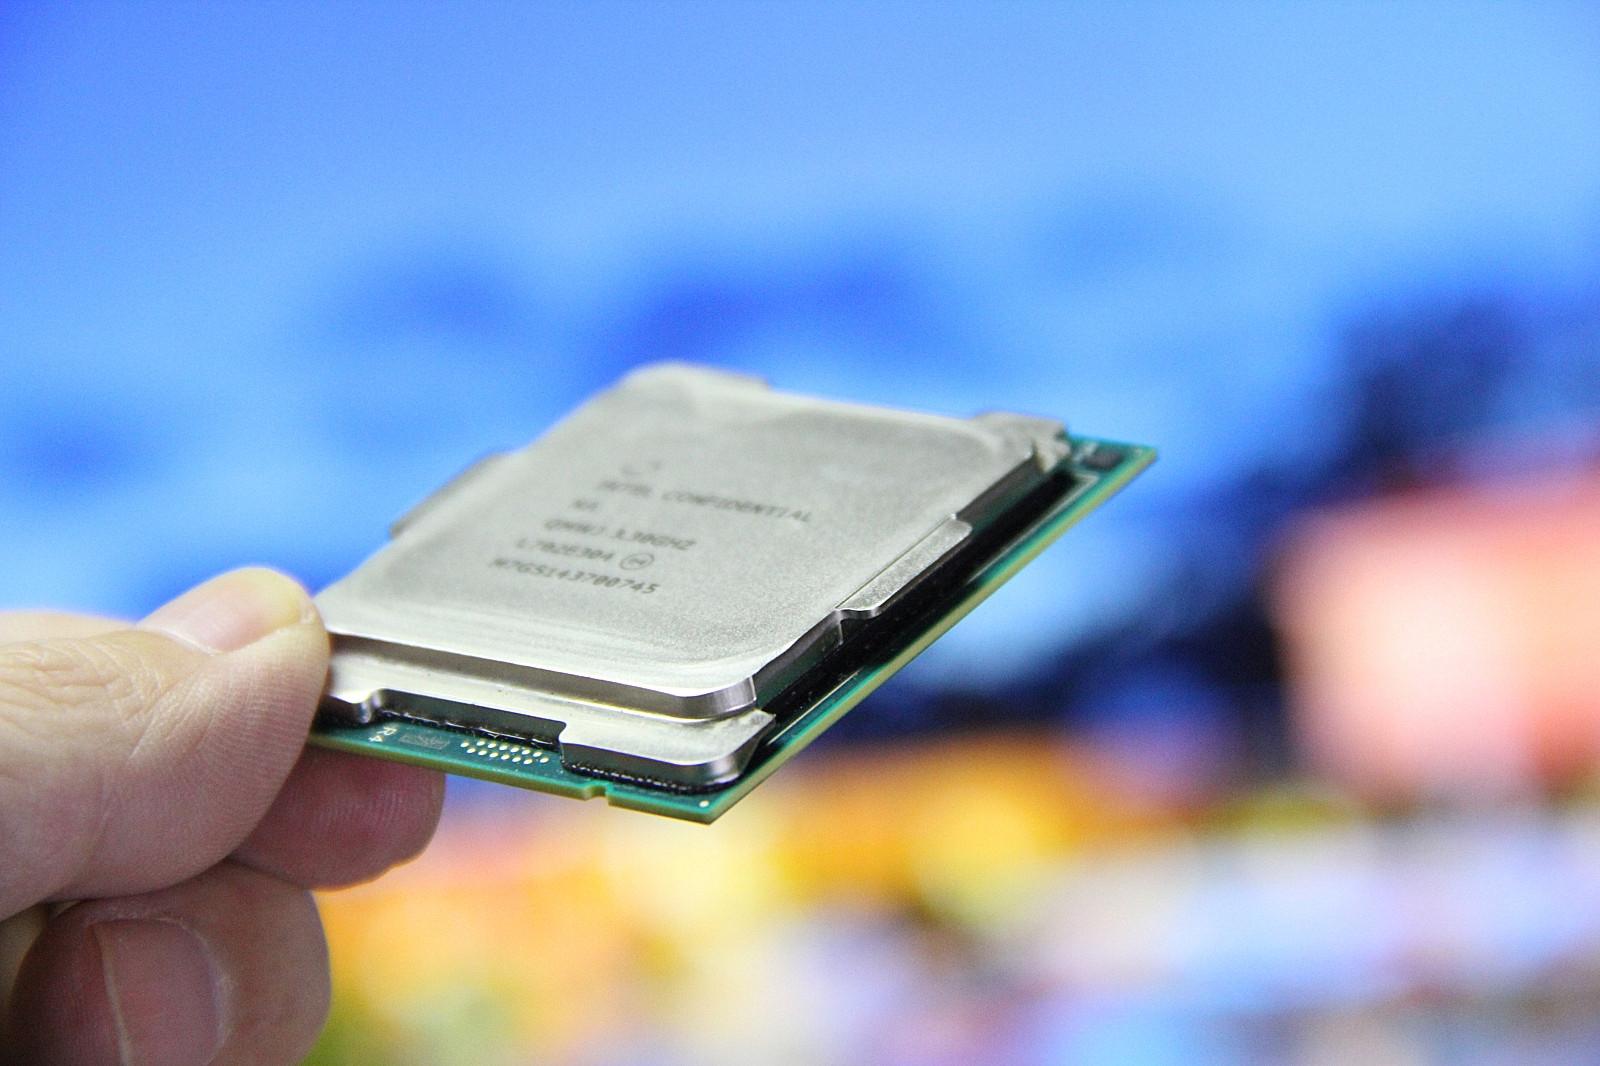 攺#hy.��i��k�yk�_intel i9-9900k/i7-9700k 10月发售?还有18核新core x